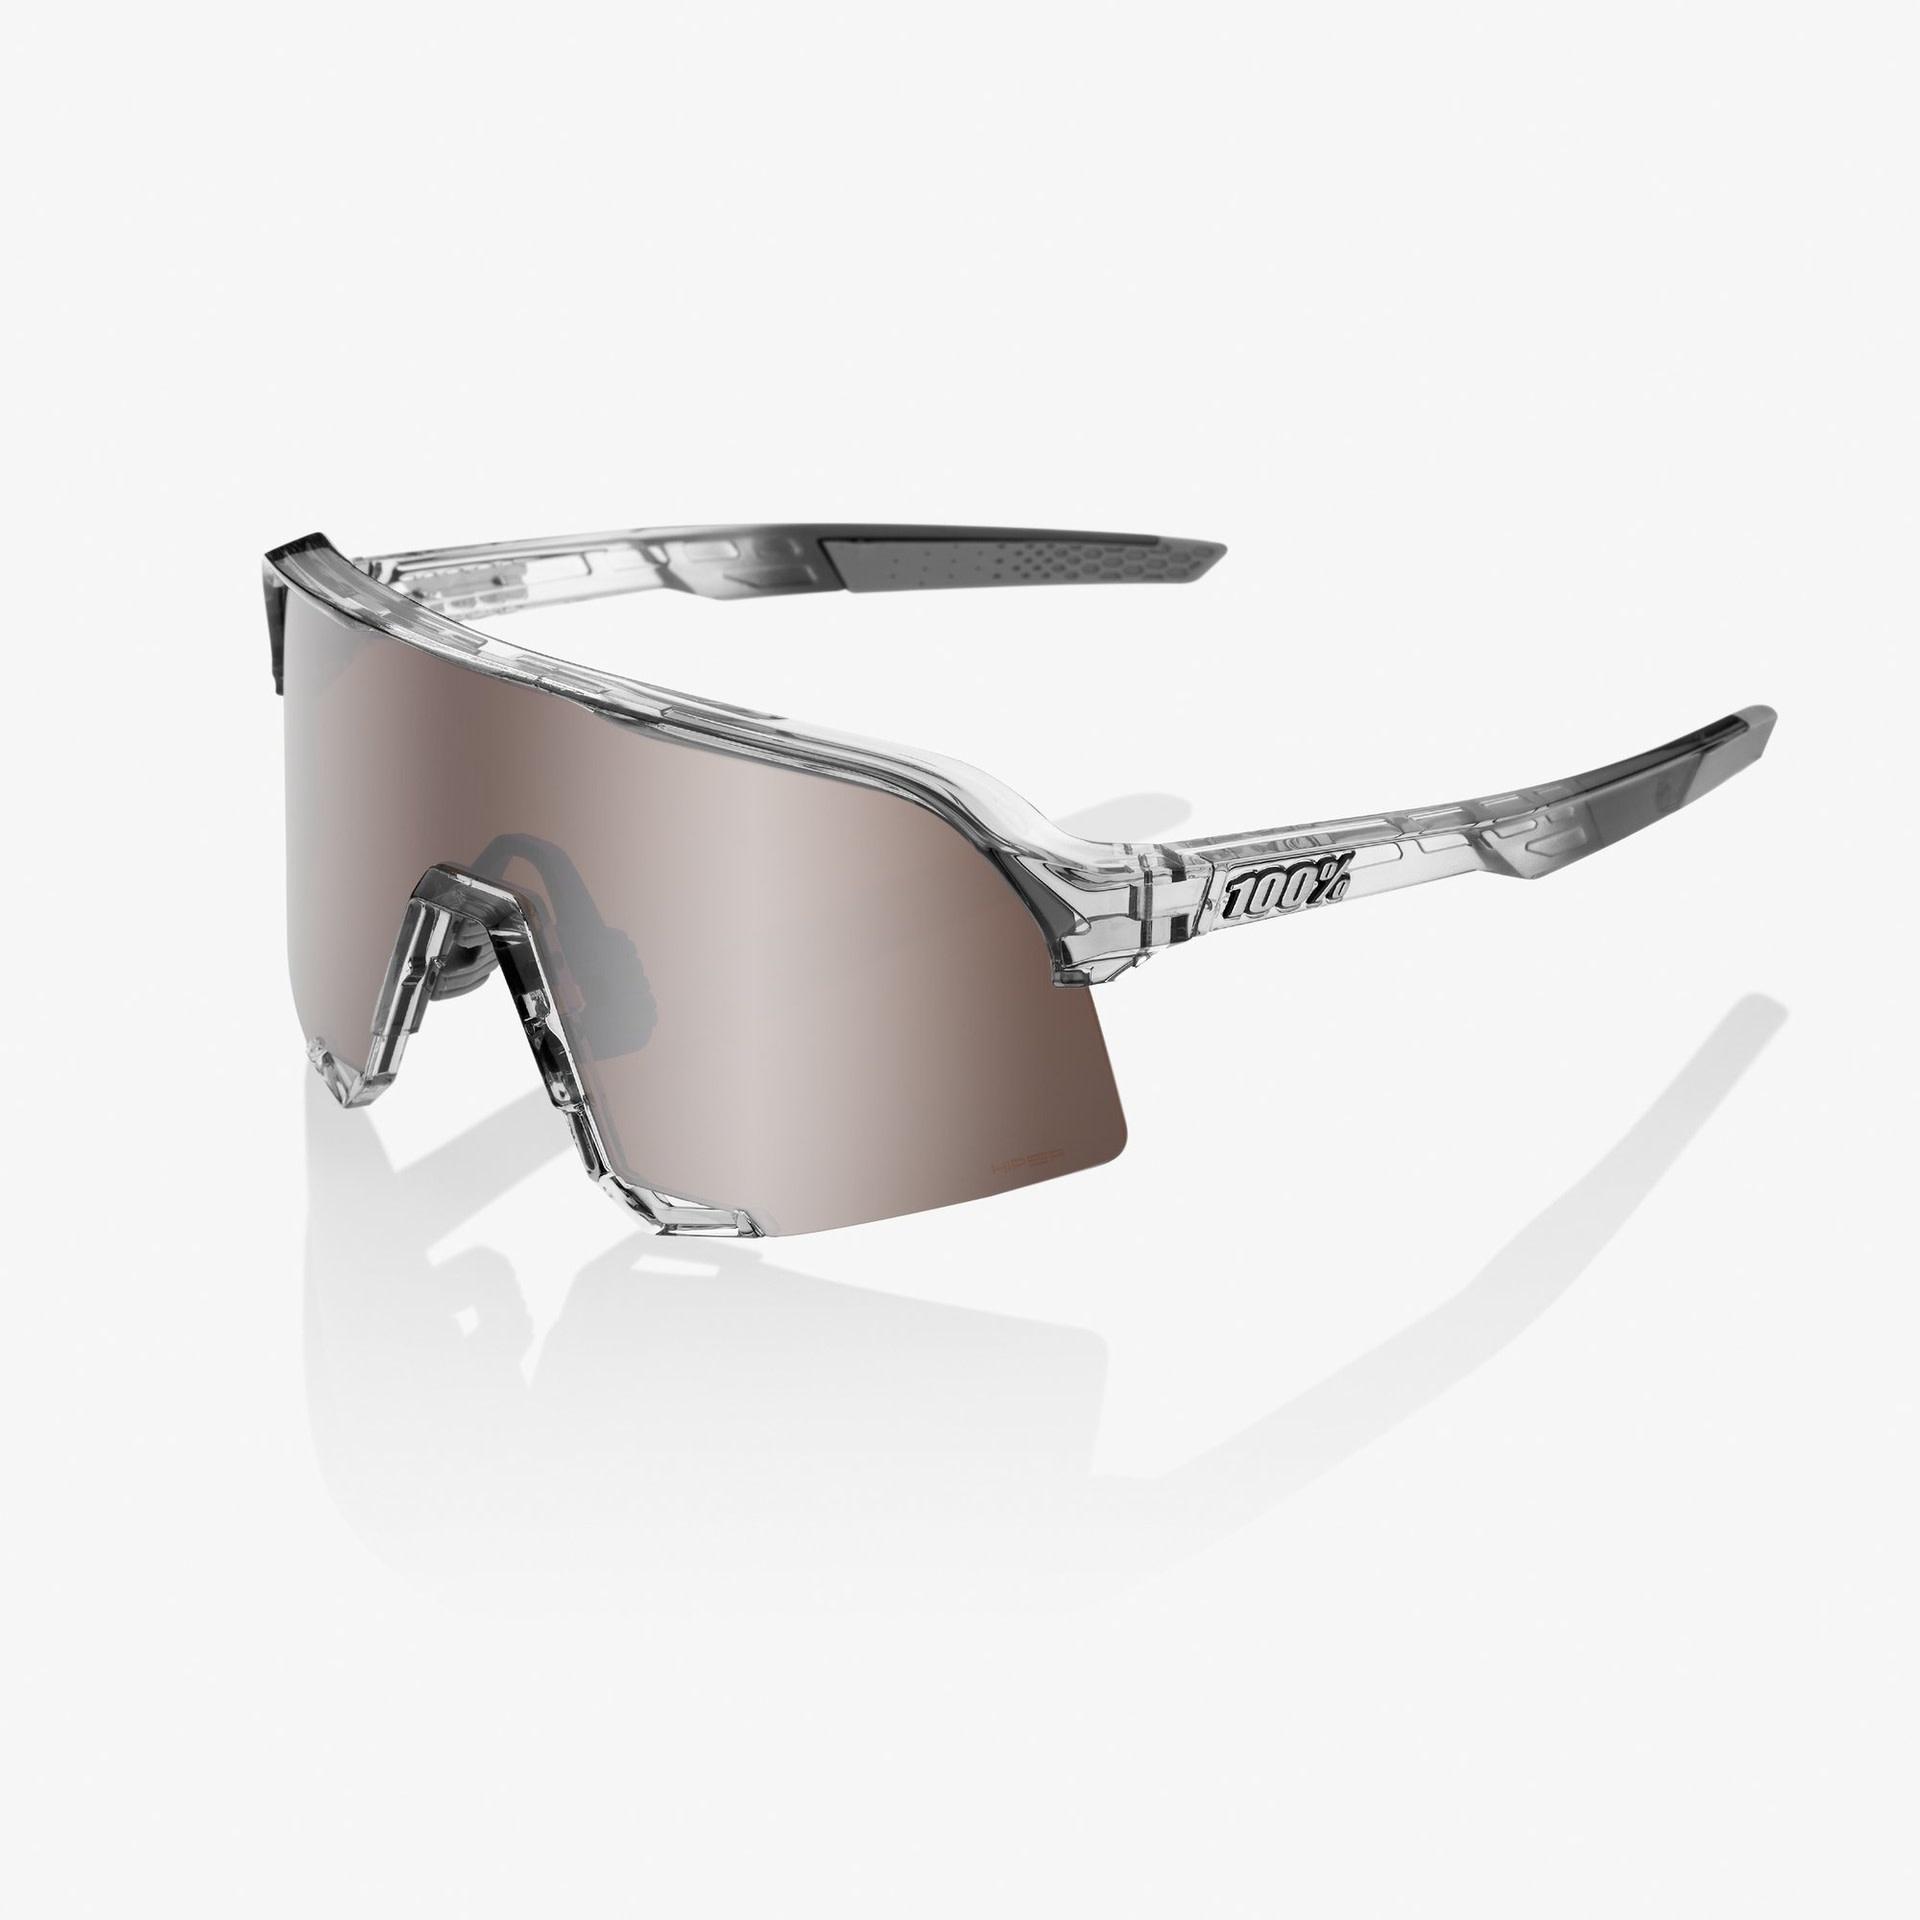 100% S3 Translucent - Hiper Silver Mirror-1